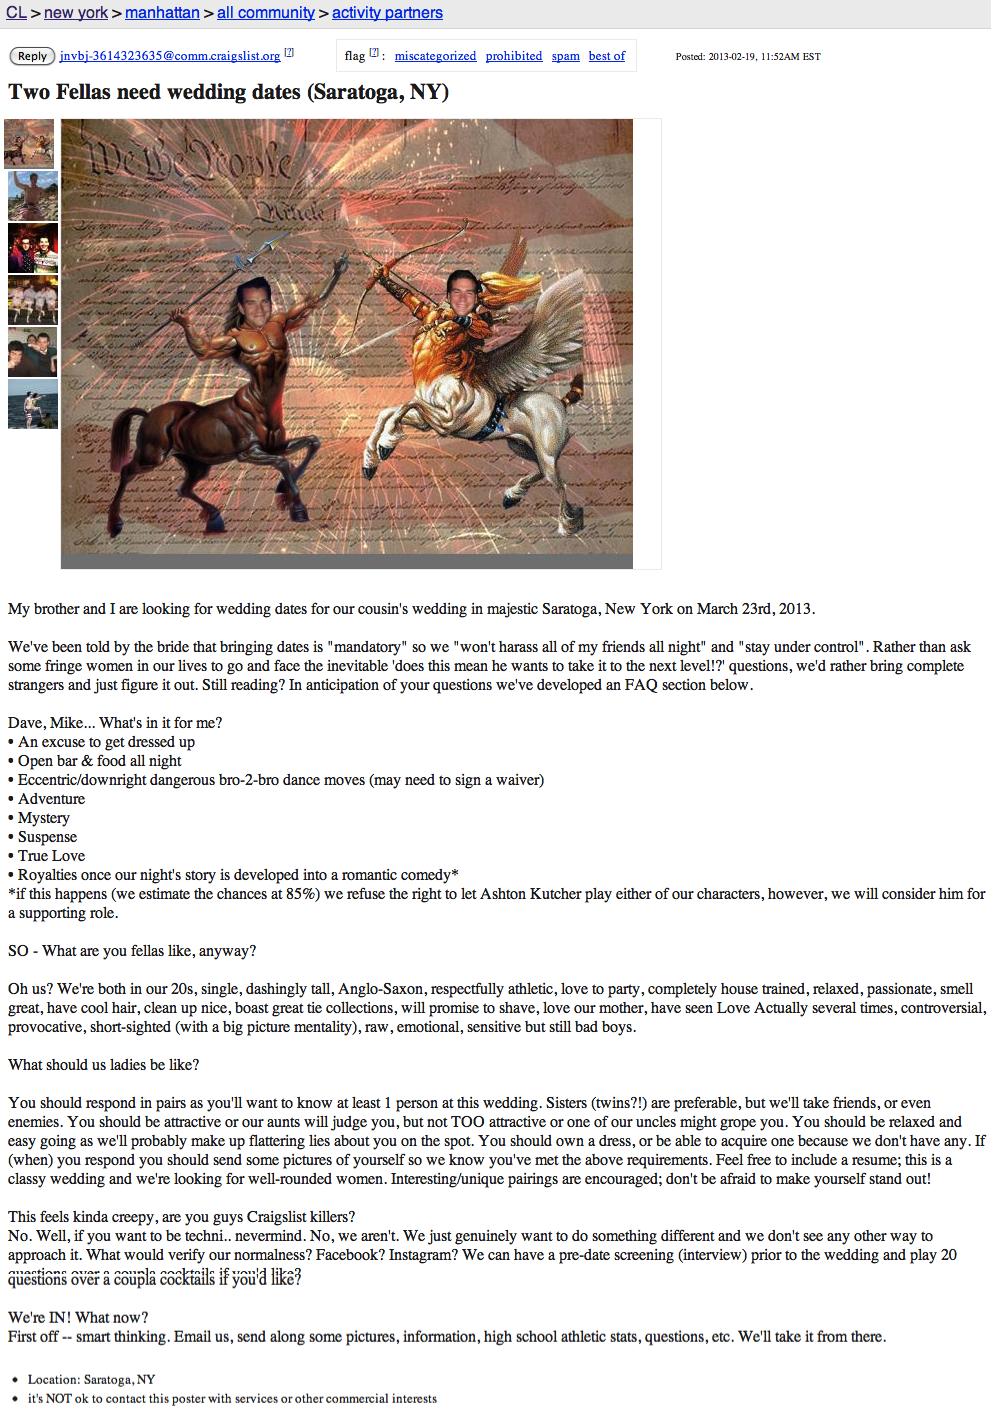 Brothers Seeking Wedding Dates Post Centaur Pic On Craigslist And Get Massive Response The Funny Pics Centaur